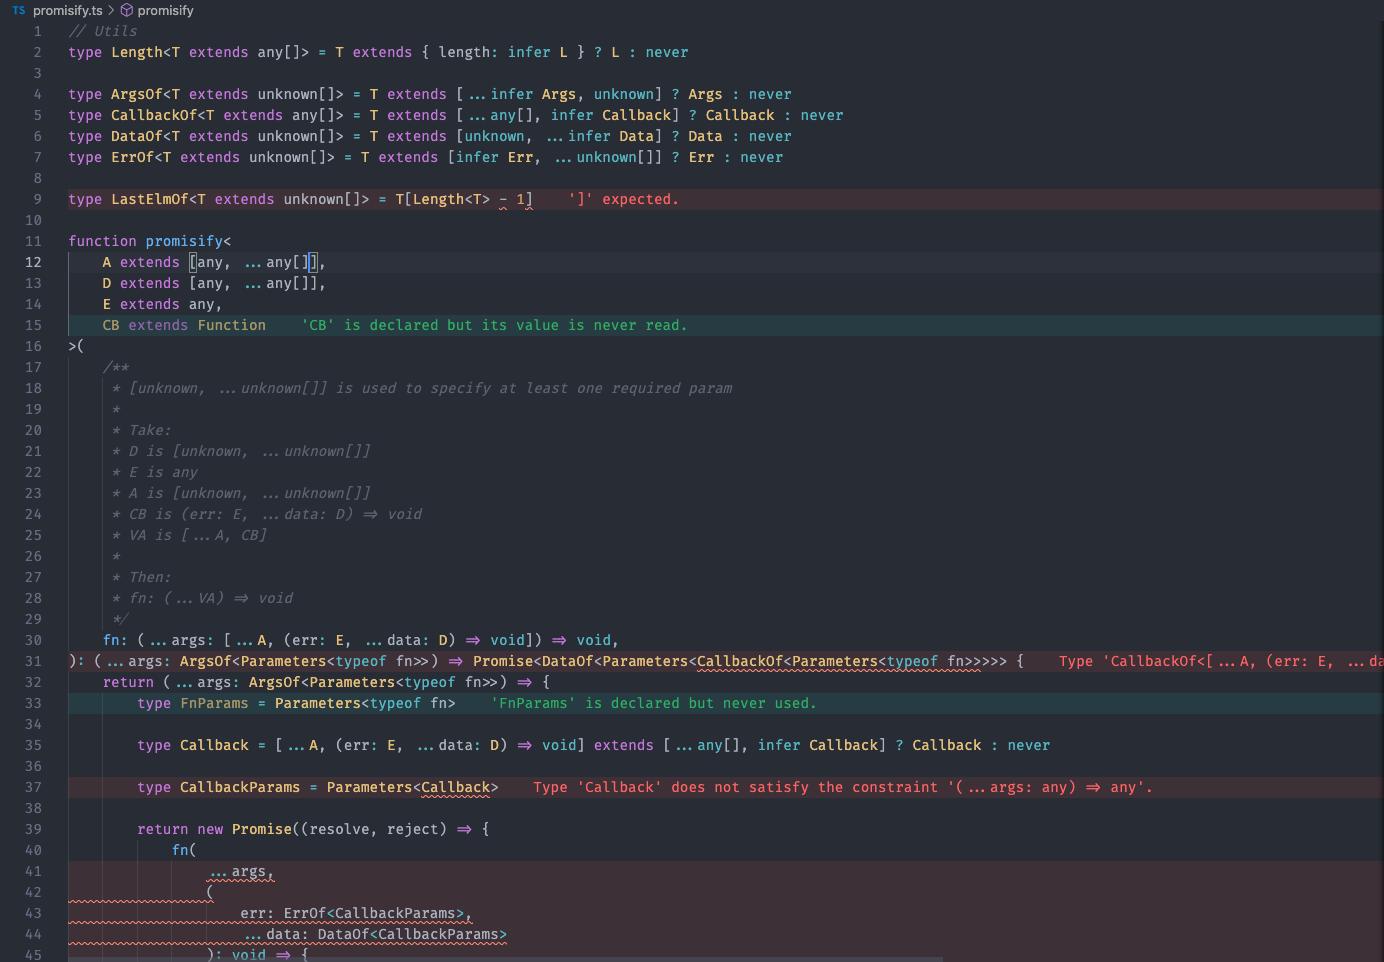 https://cloud-2sz93dn4y-hack-club-bot.vercel.app/0screenshot_2021-04-02_at_1.24.29_pm.png